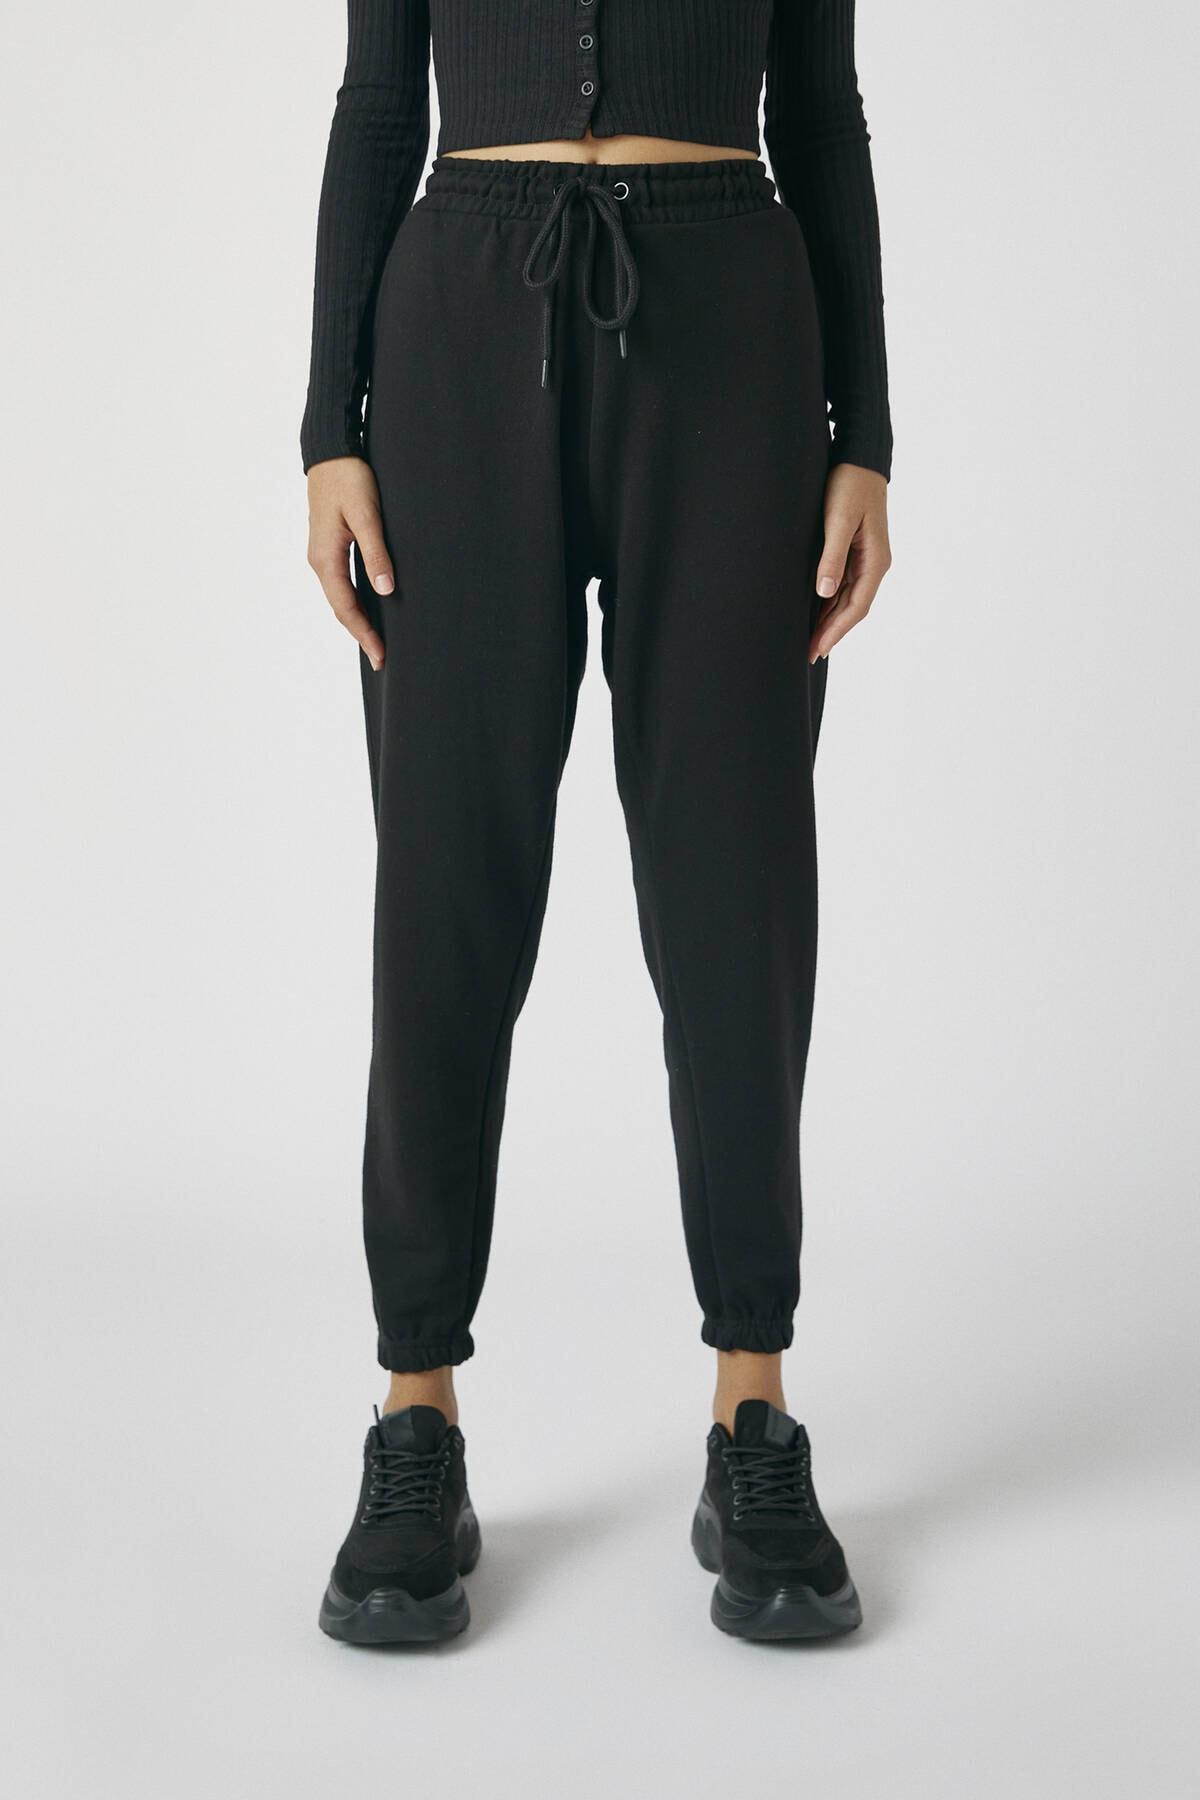 Pull & Bear Kadın Siyah Elastik Paçalı Basic Jogging Fit Pantolon 05670324 2